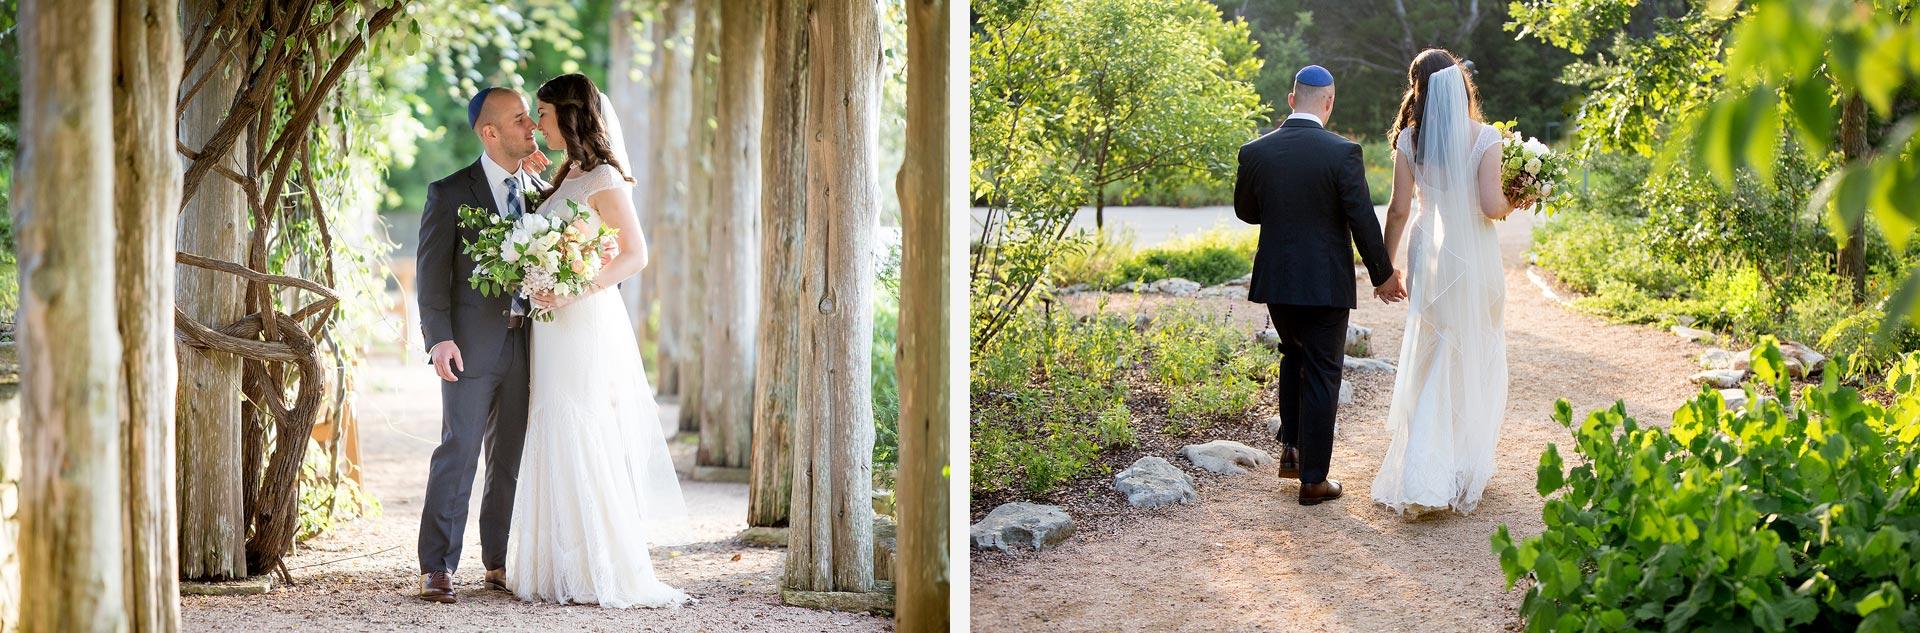 Jewish Wedding in Texas